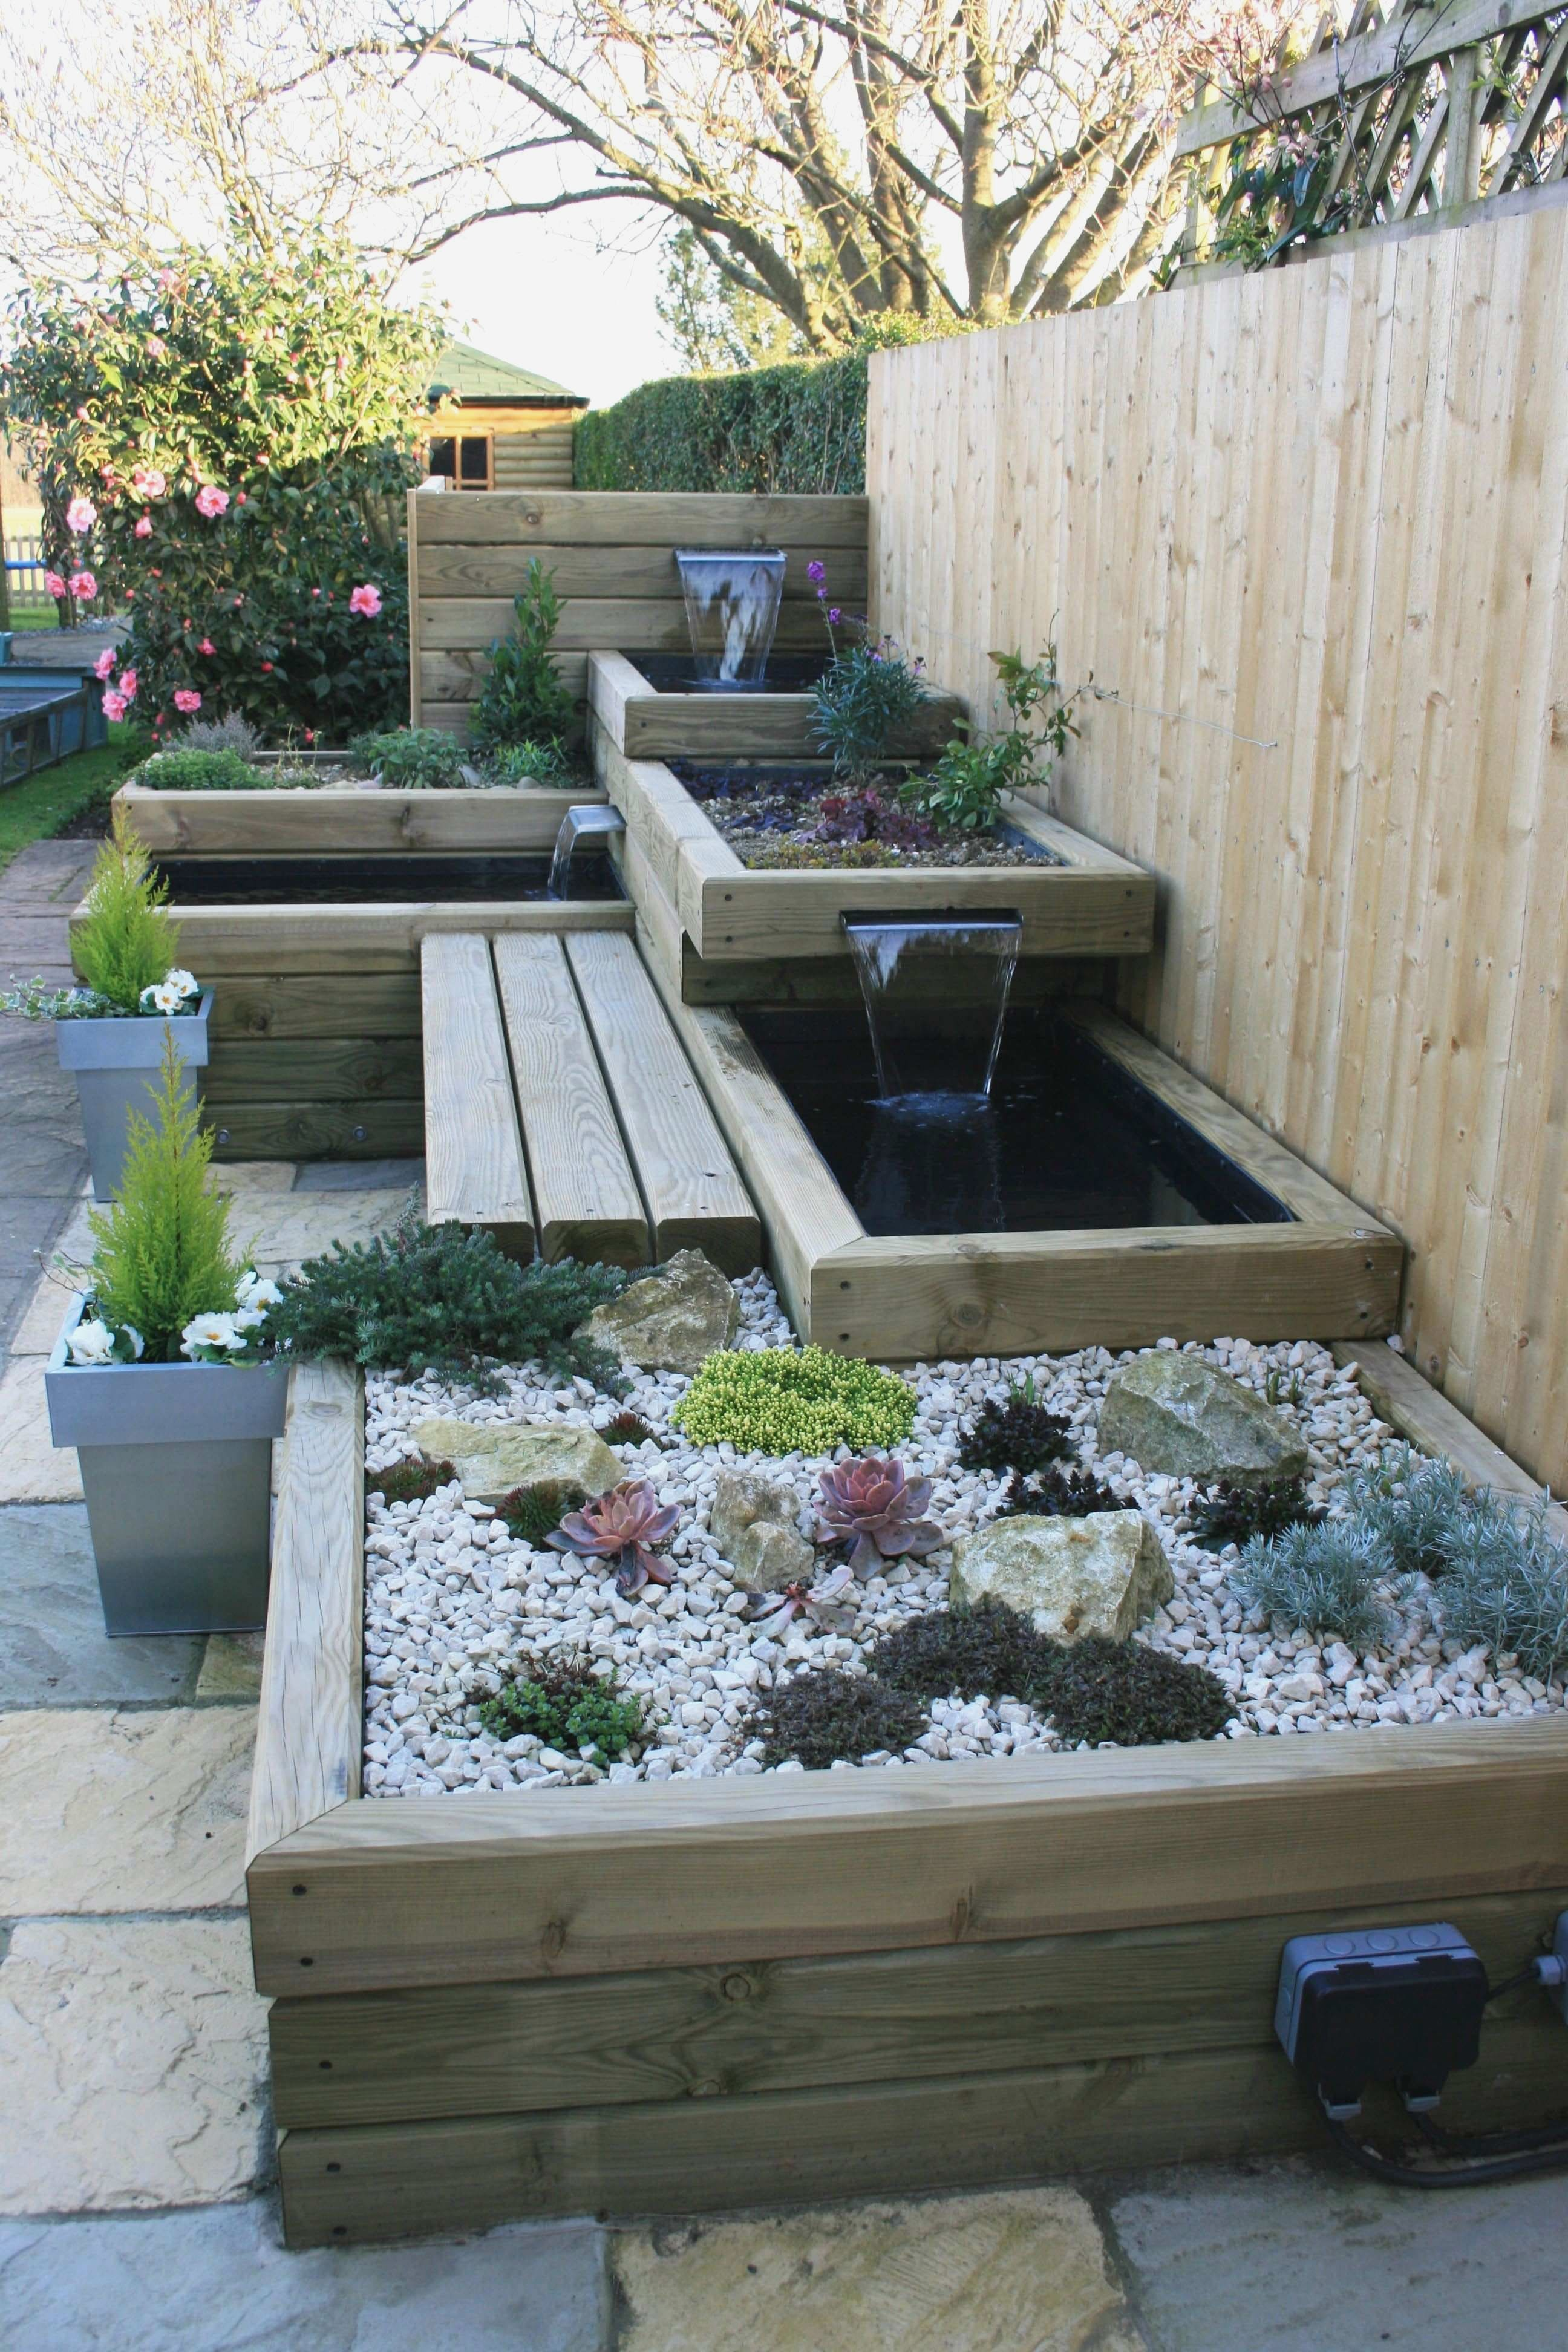 20.SIMPHOME.COM view free backyard design tool interior design ideas top in design